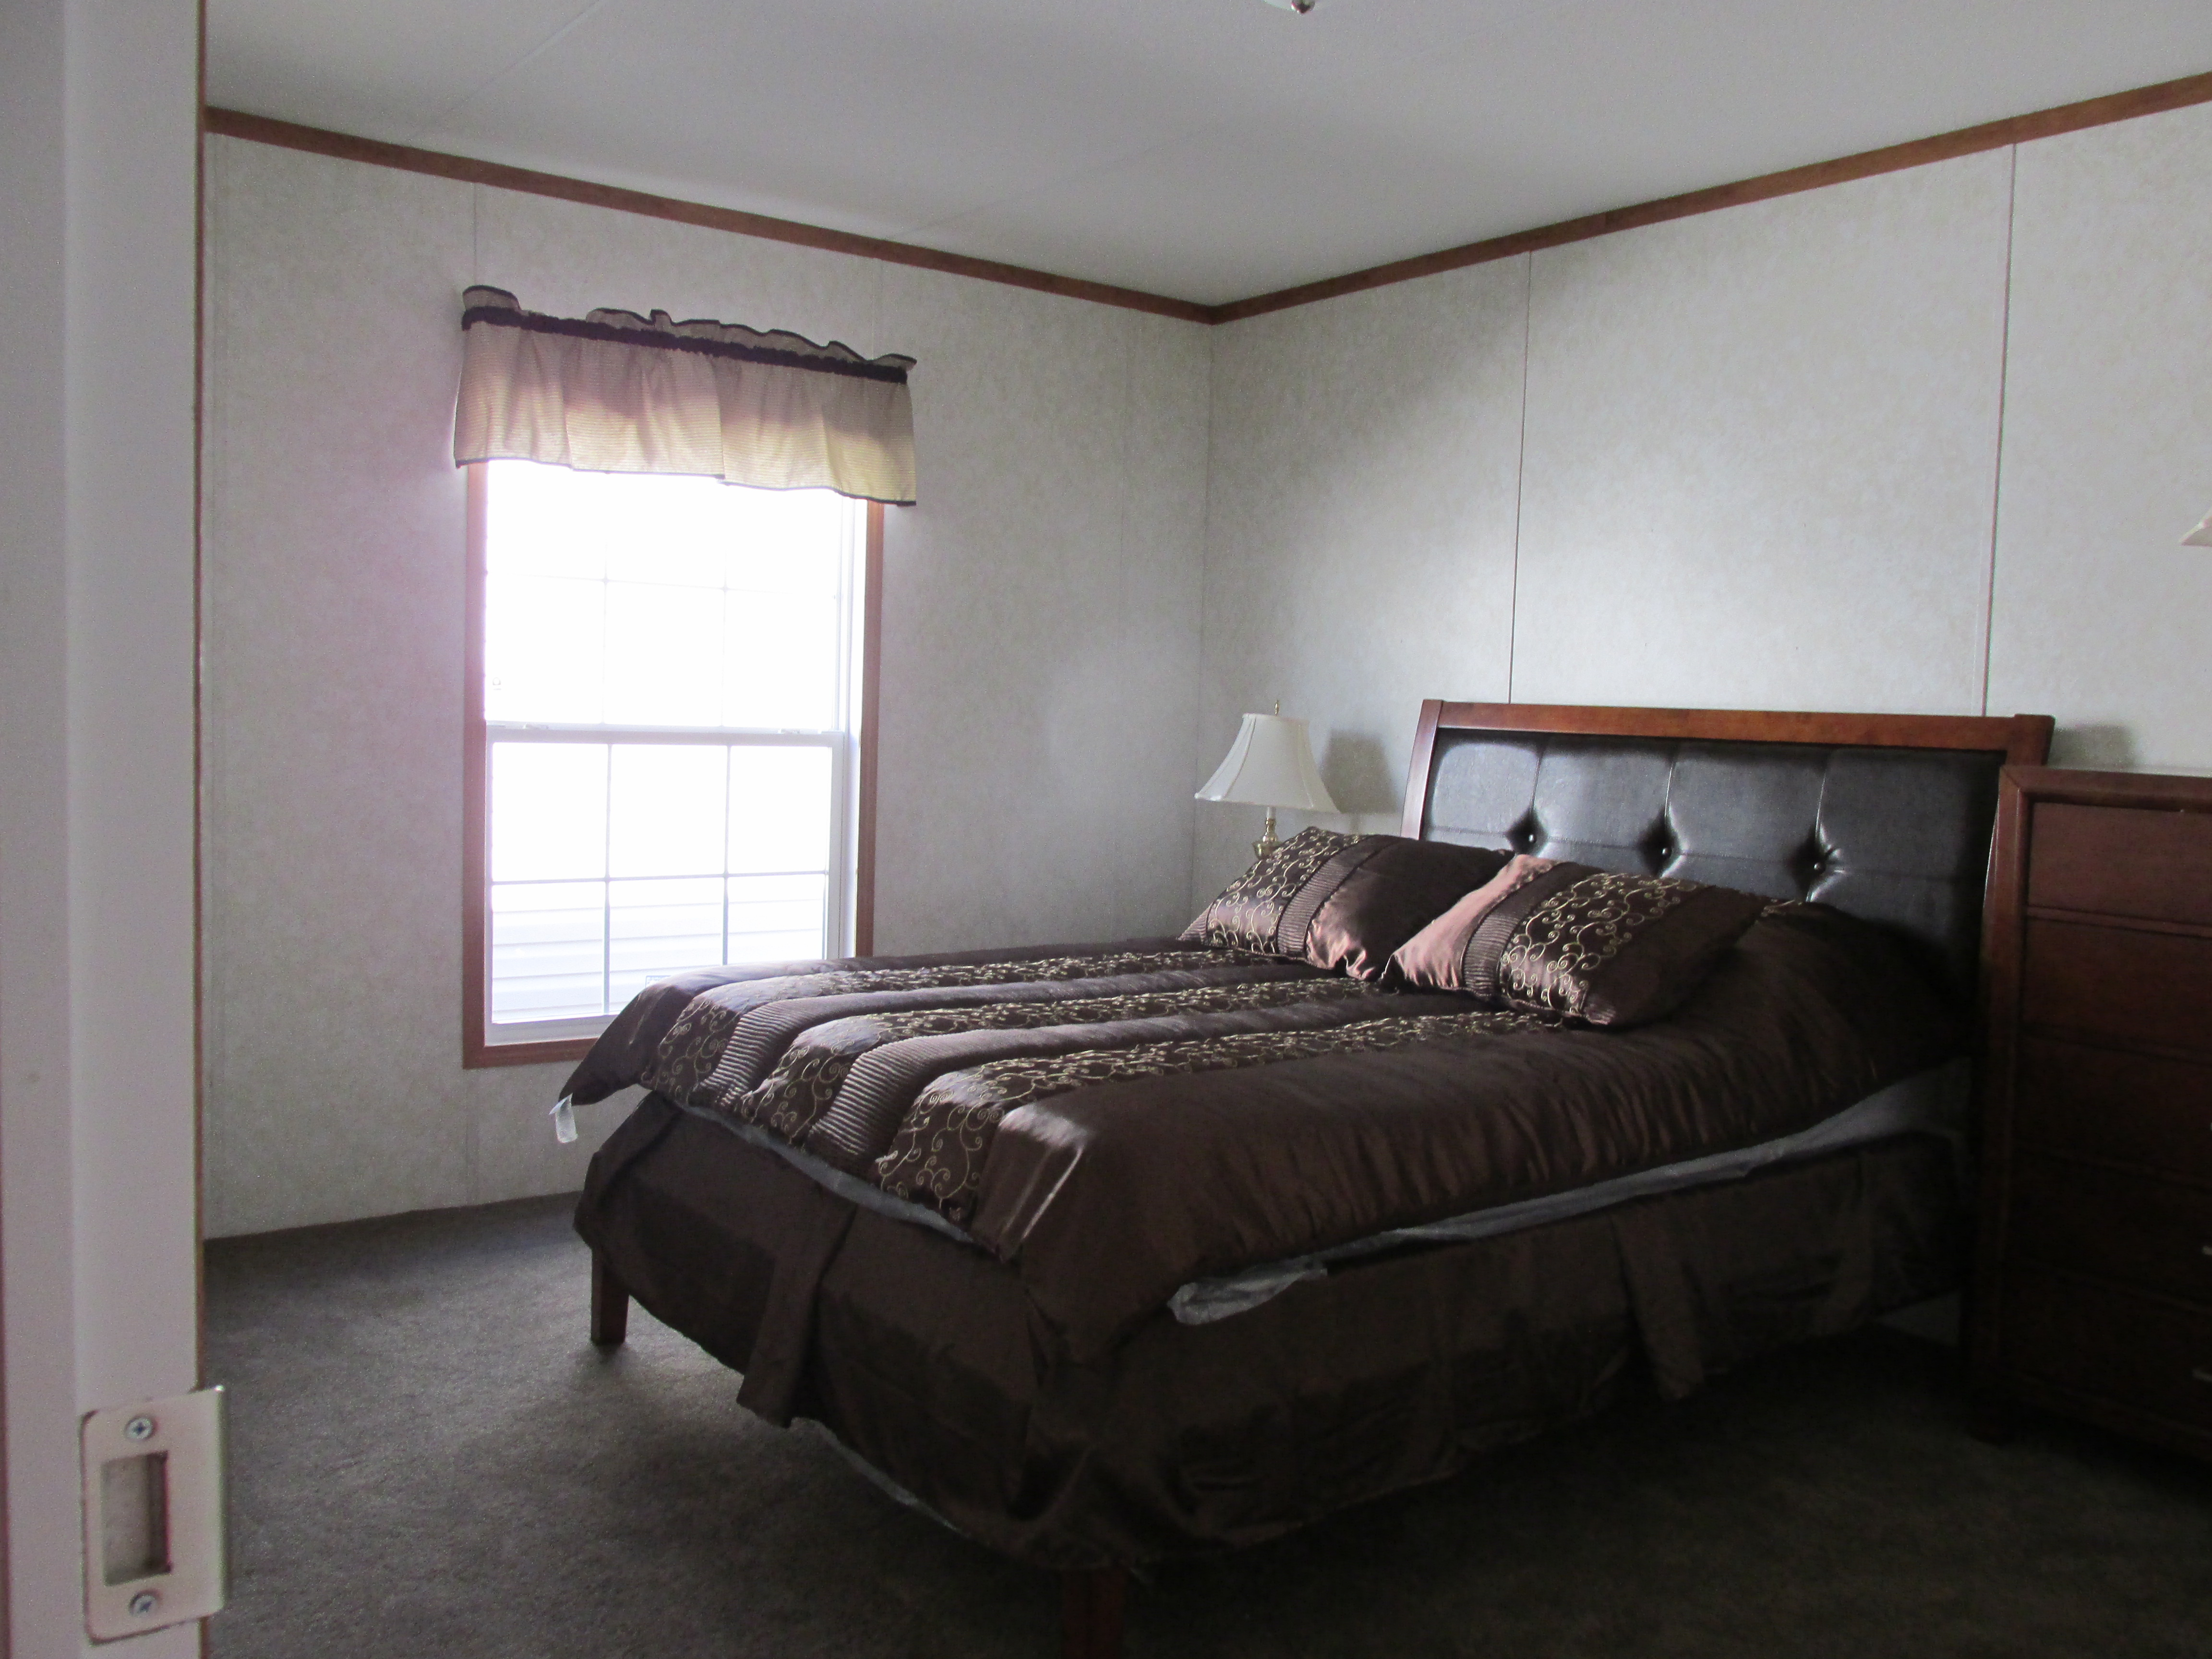 400 Bedroom#2-1.JPG